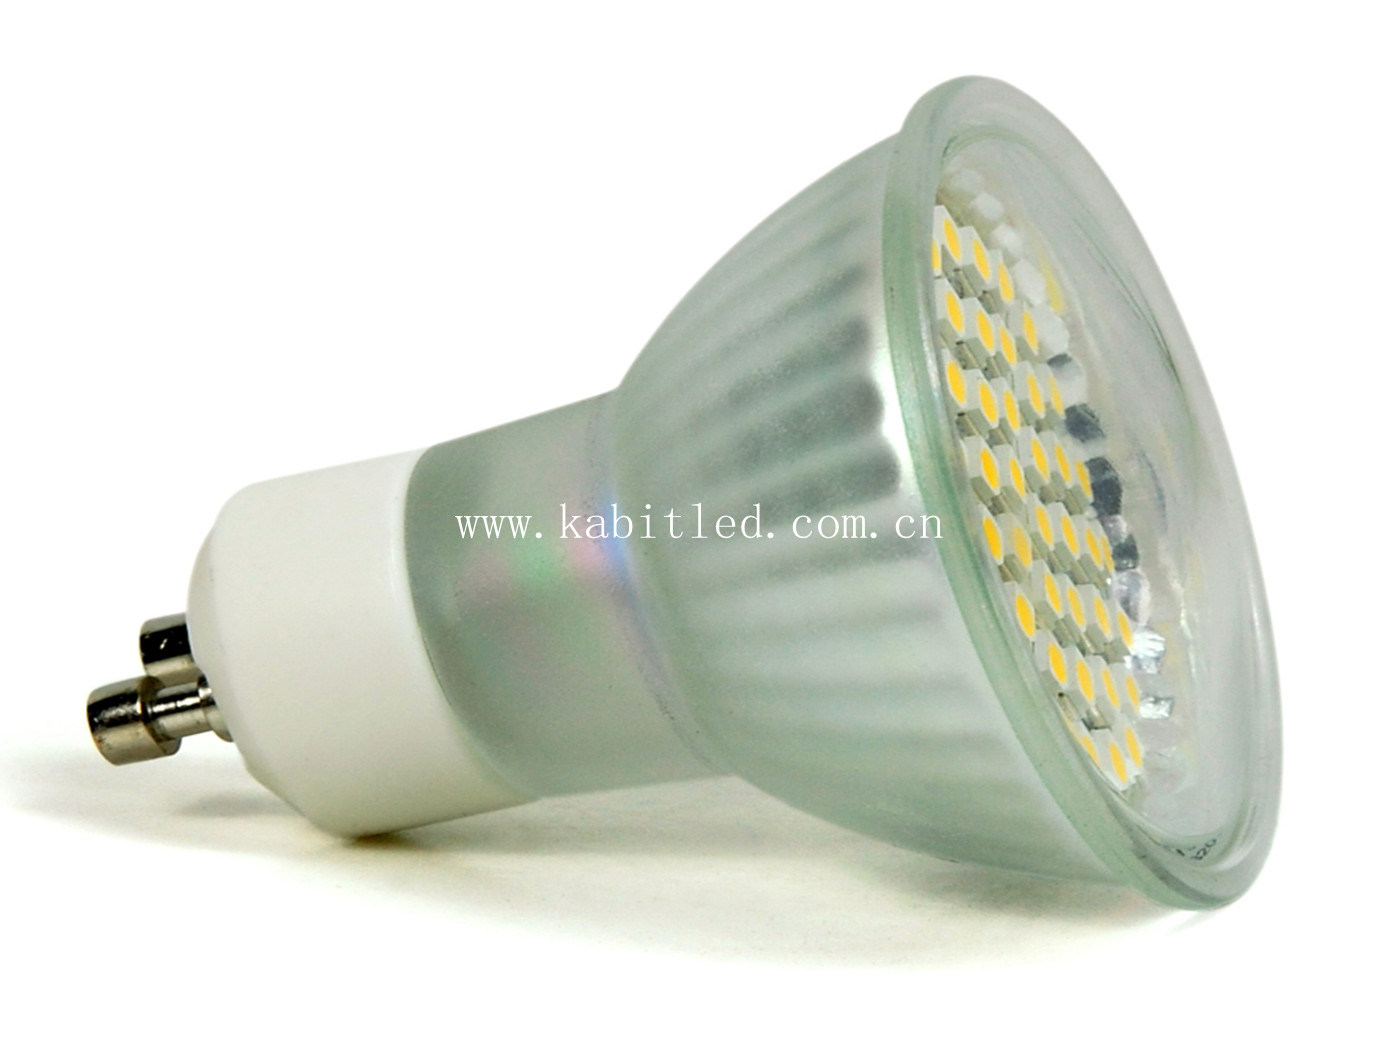 china led bulb gu10 c2016 china led bulb led lamp. Black Bedroom Furniture Sets. Home Design Ideas